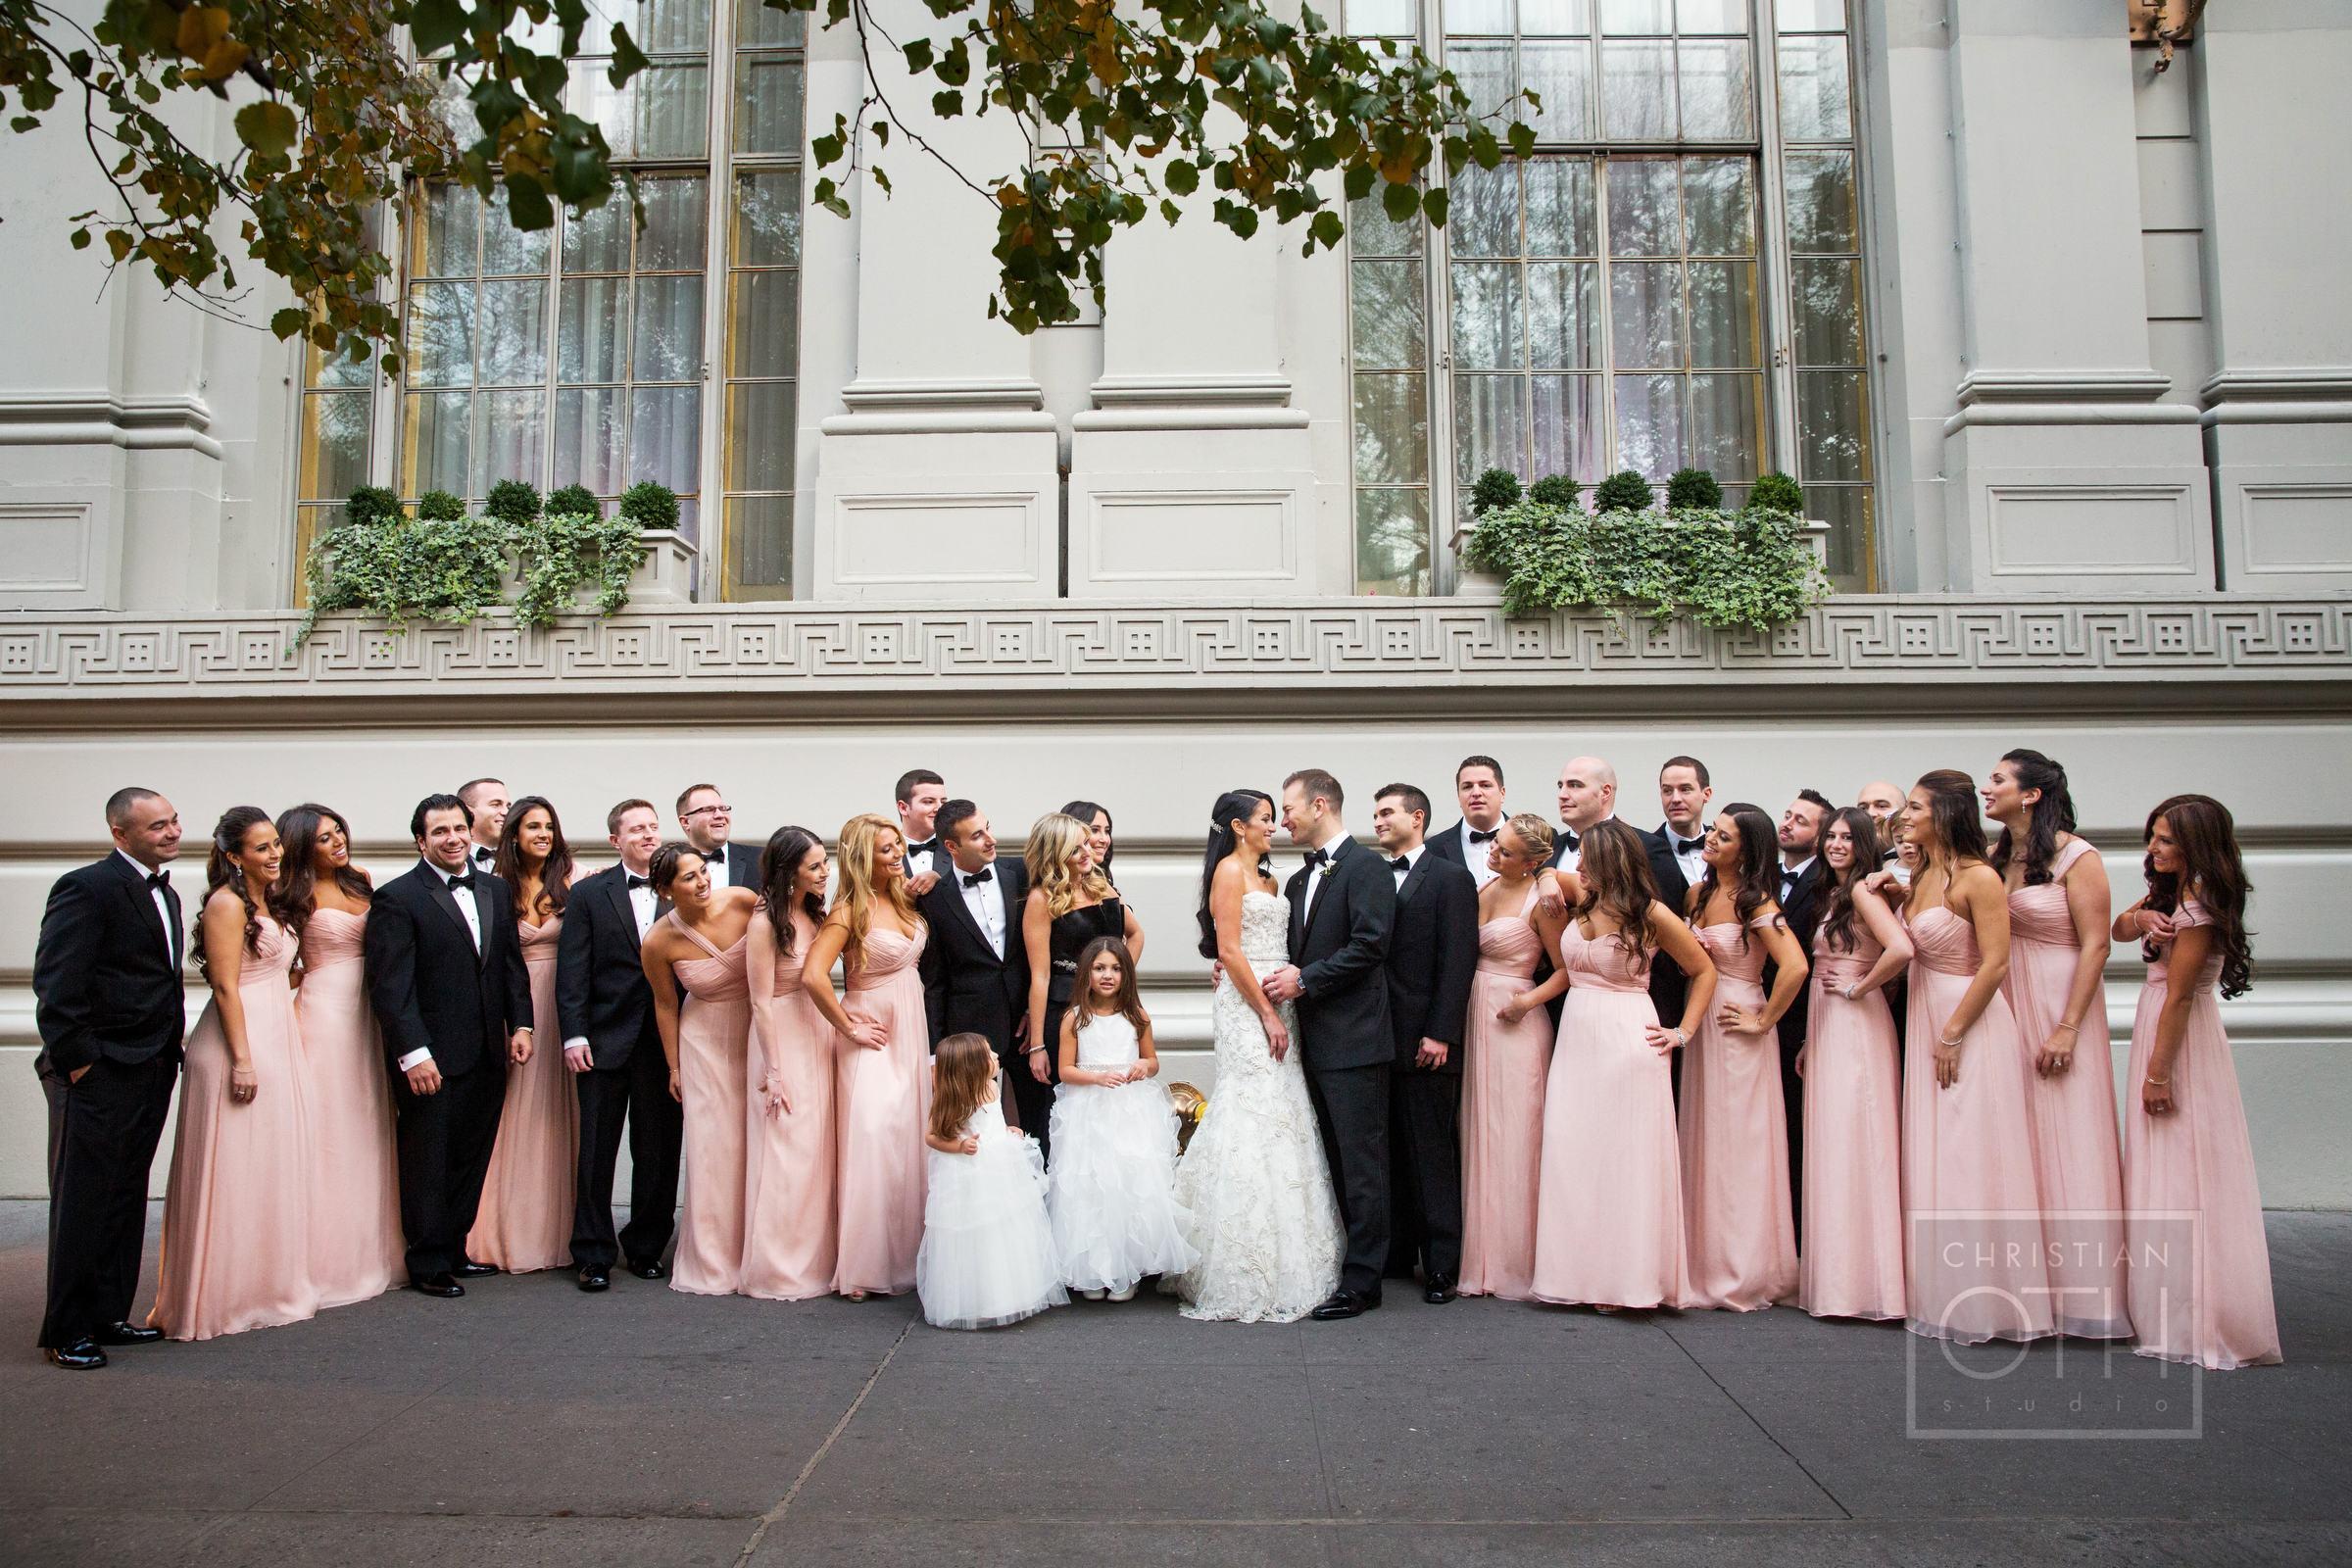 Ceci_New_York_Custom_Invitation_Pierre__City_ Destination_Wedding_Luxury_Personalized_Ceci_Style_Bride_Rose_Gold_Foil_Stamping64.JPG